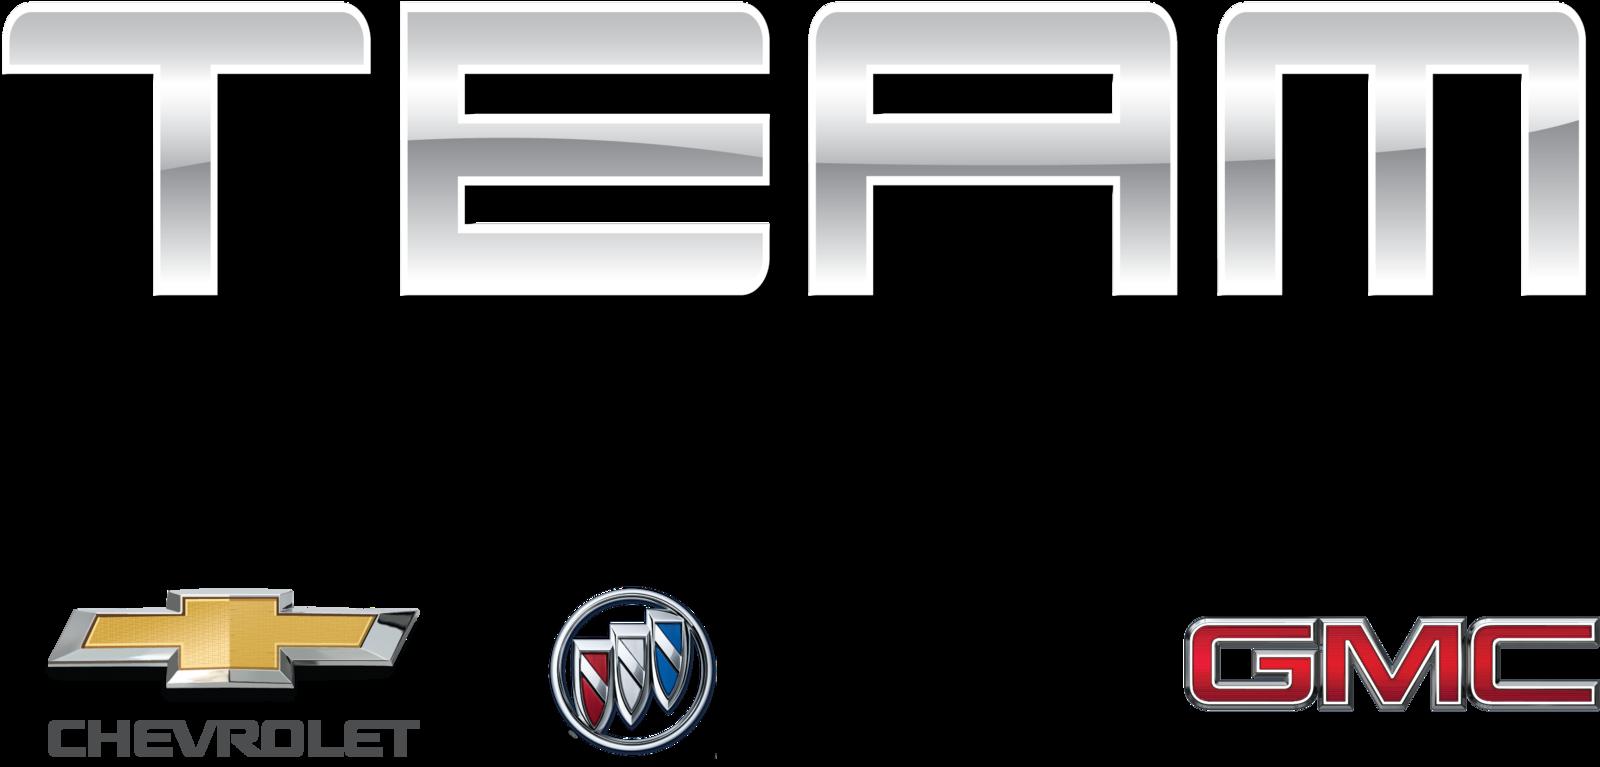 Team Chevrolet Buick GMC Cadillac - Salisbury, NC: Read ...